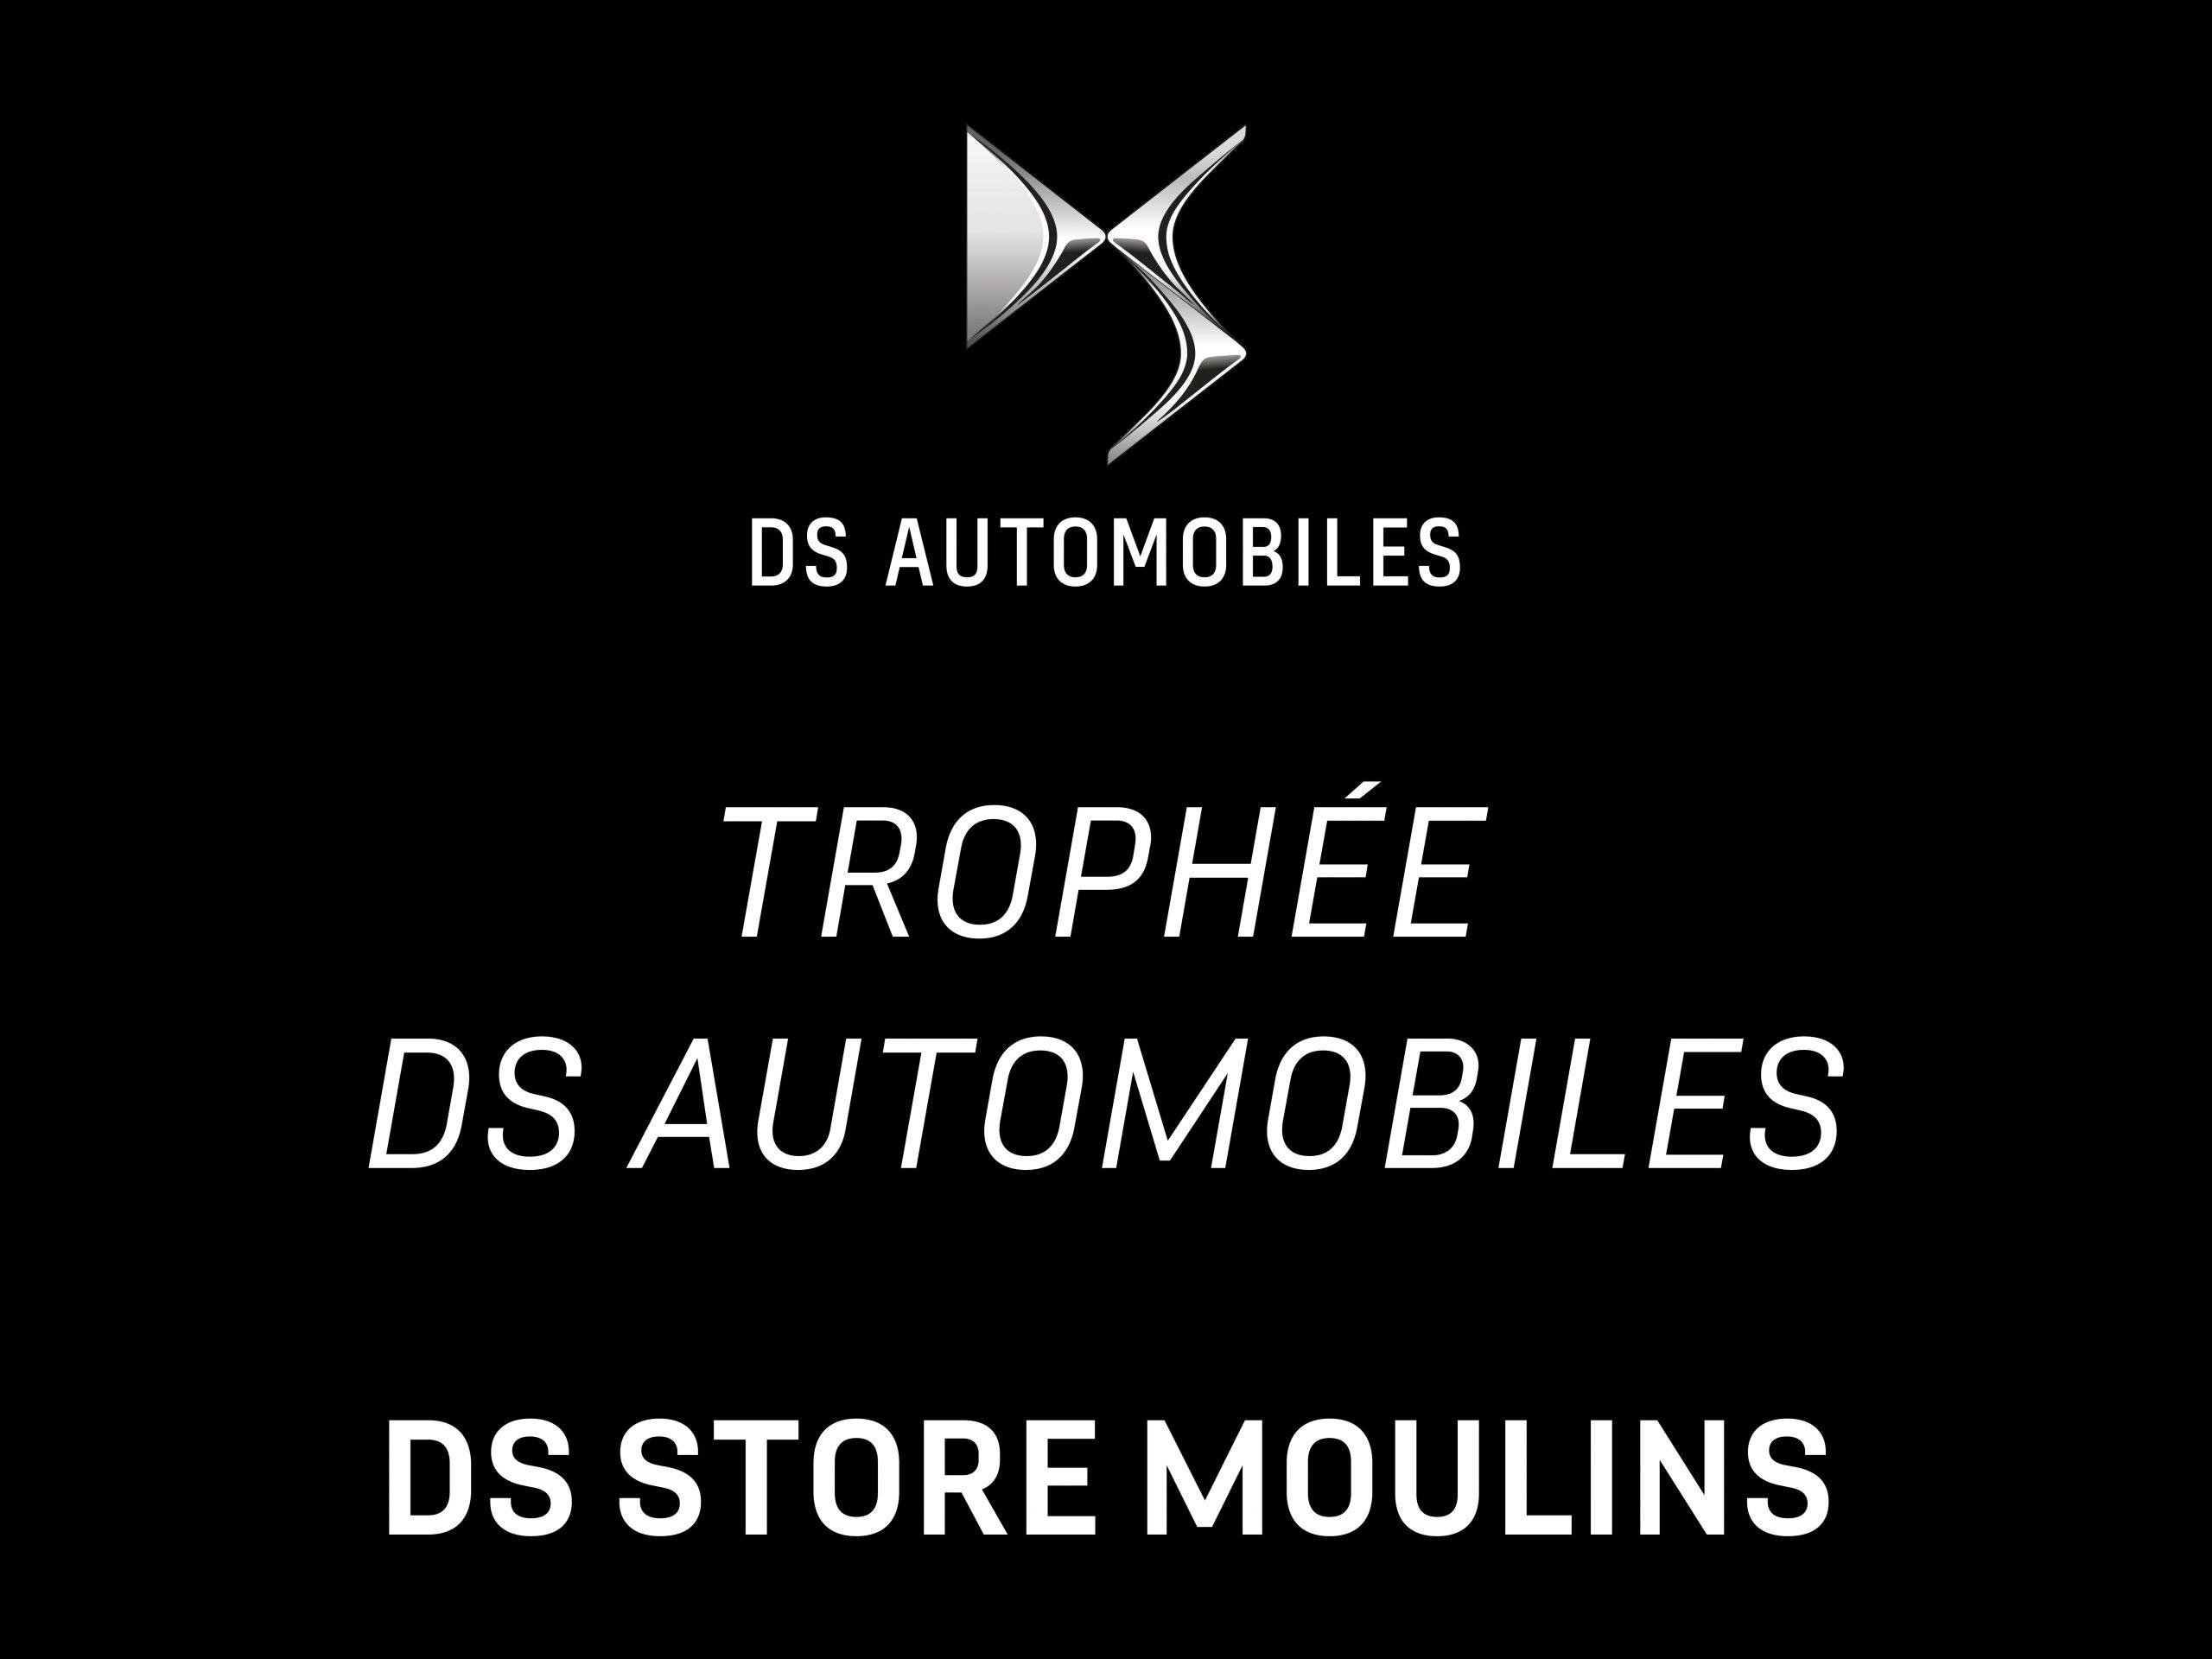 DS STORE MOULINS